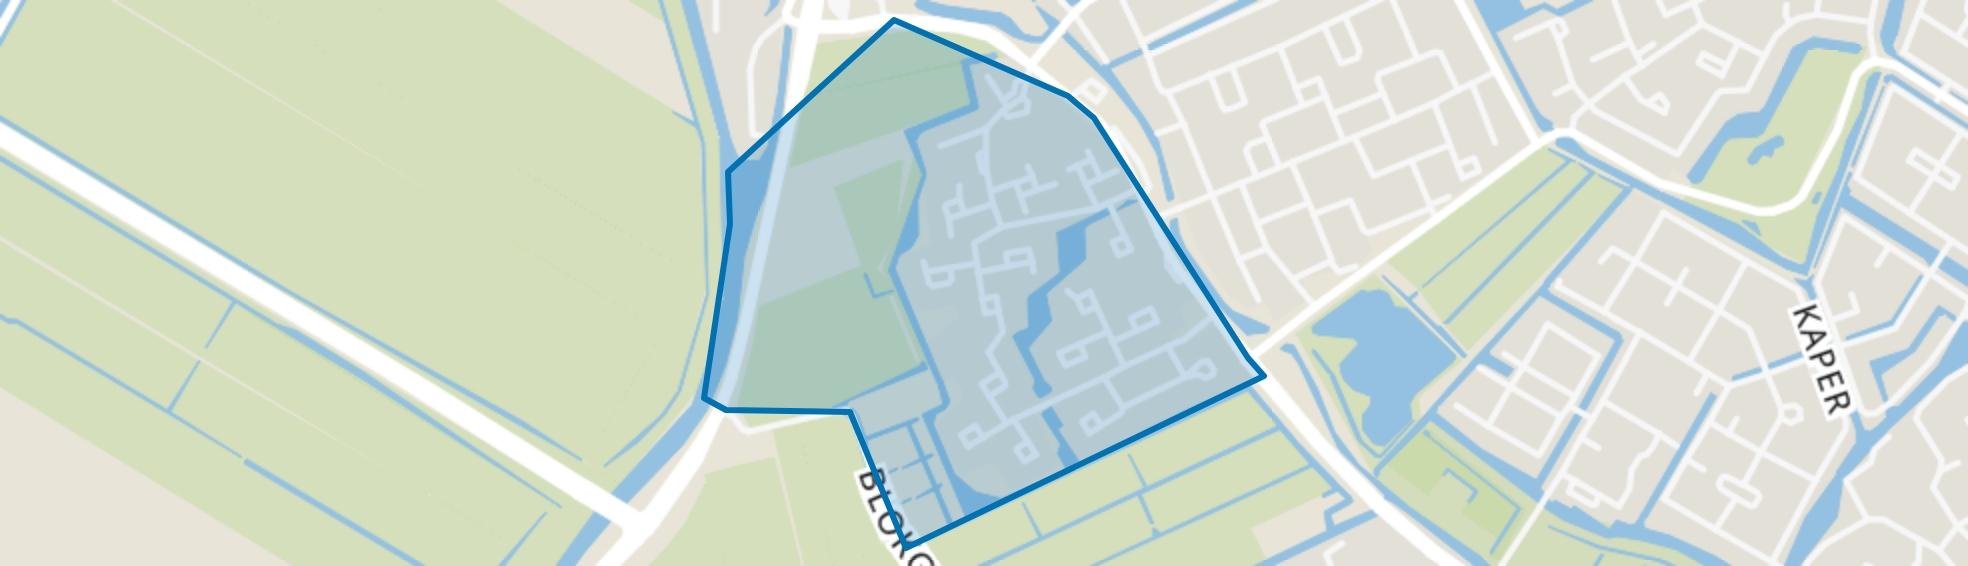 Edam-Zuid, Edam map